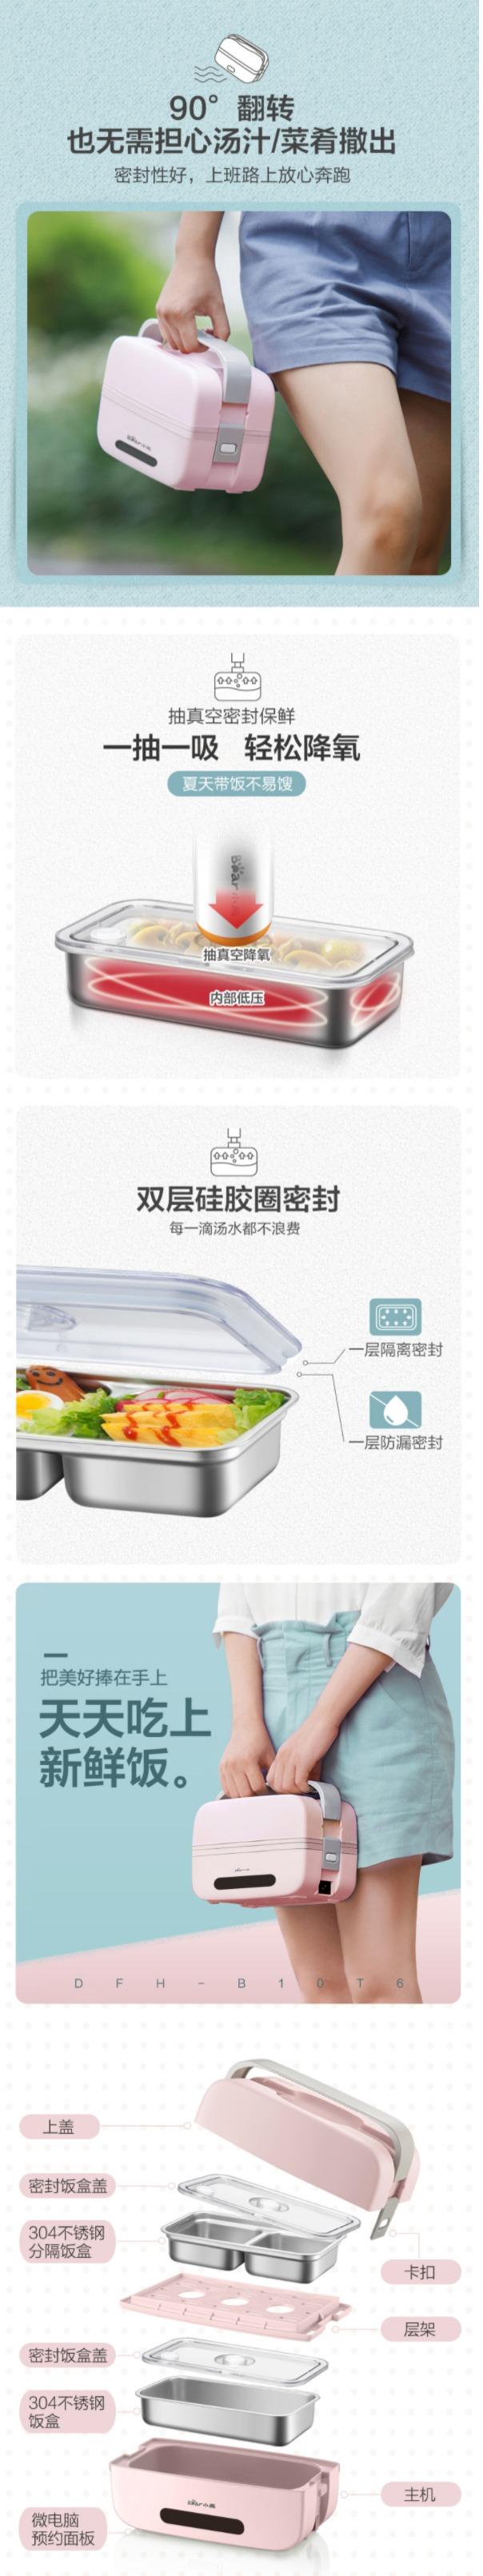 Bear 小熊 高颜值 双层微电脑智能 电蒸电煮饭盒 63加元包邮!上班上学煮饭带饭神器!